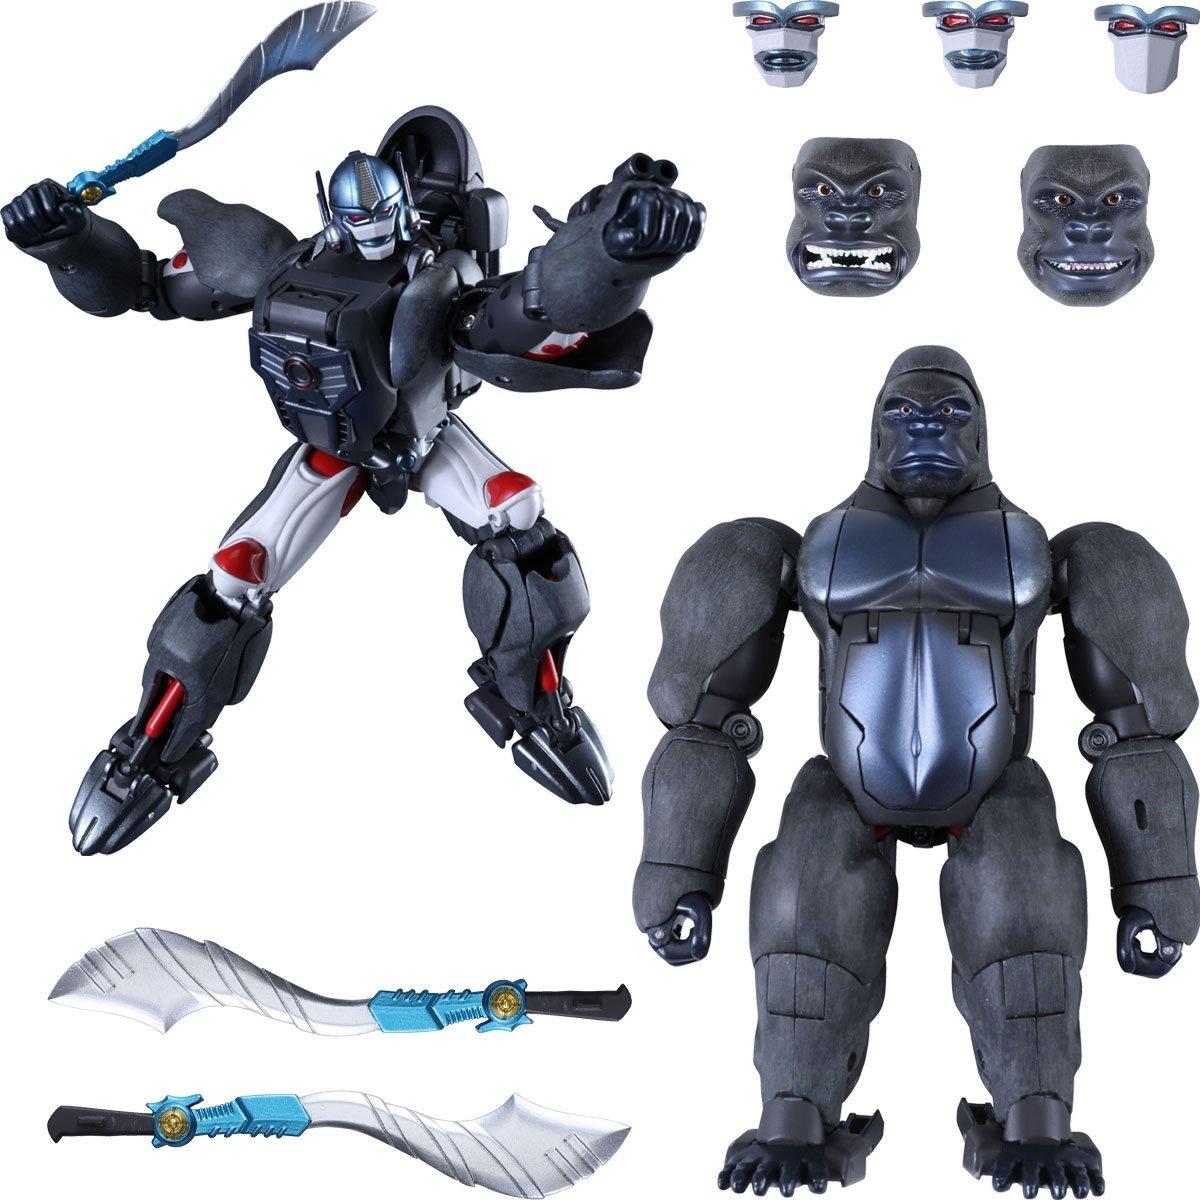 Takara-Tomy Transformers Masterpiece MP-32 Optimus Primal (Re-Issue) Figure Pre-Orders